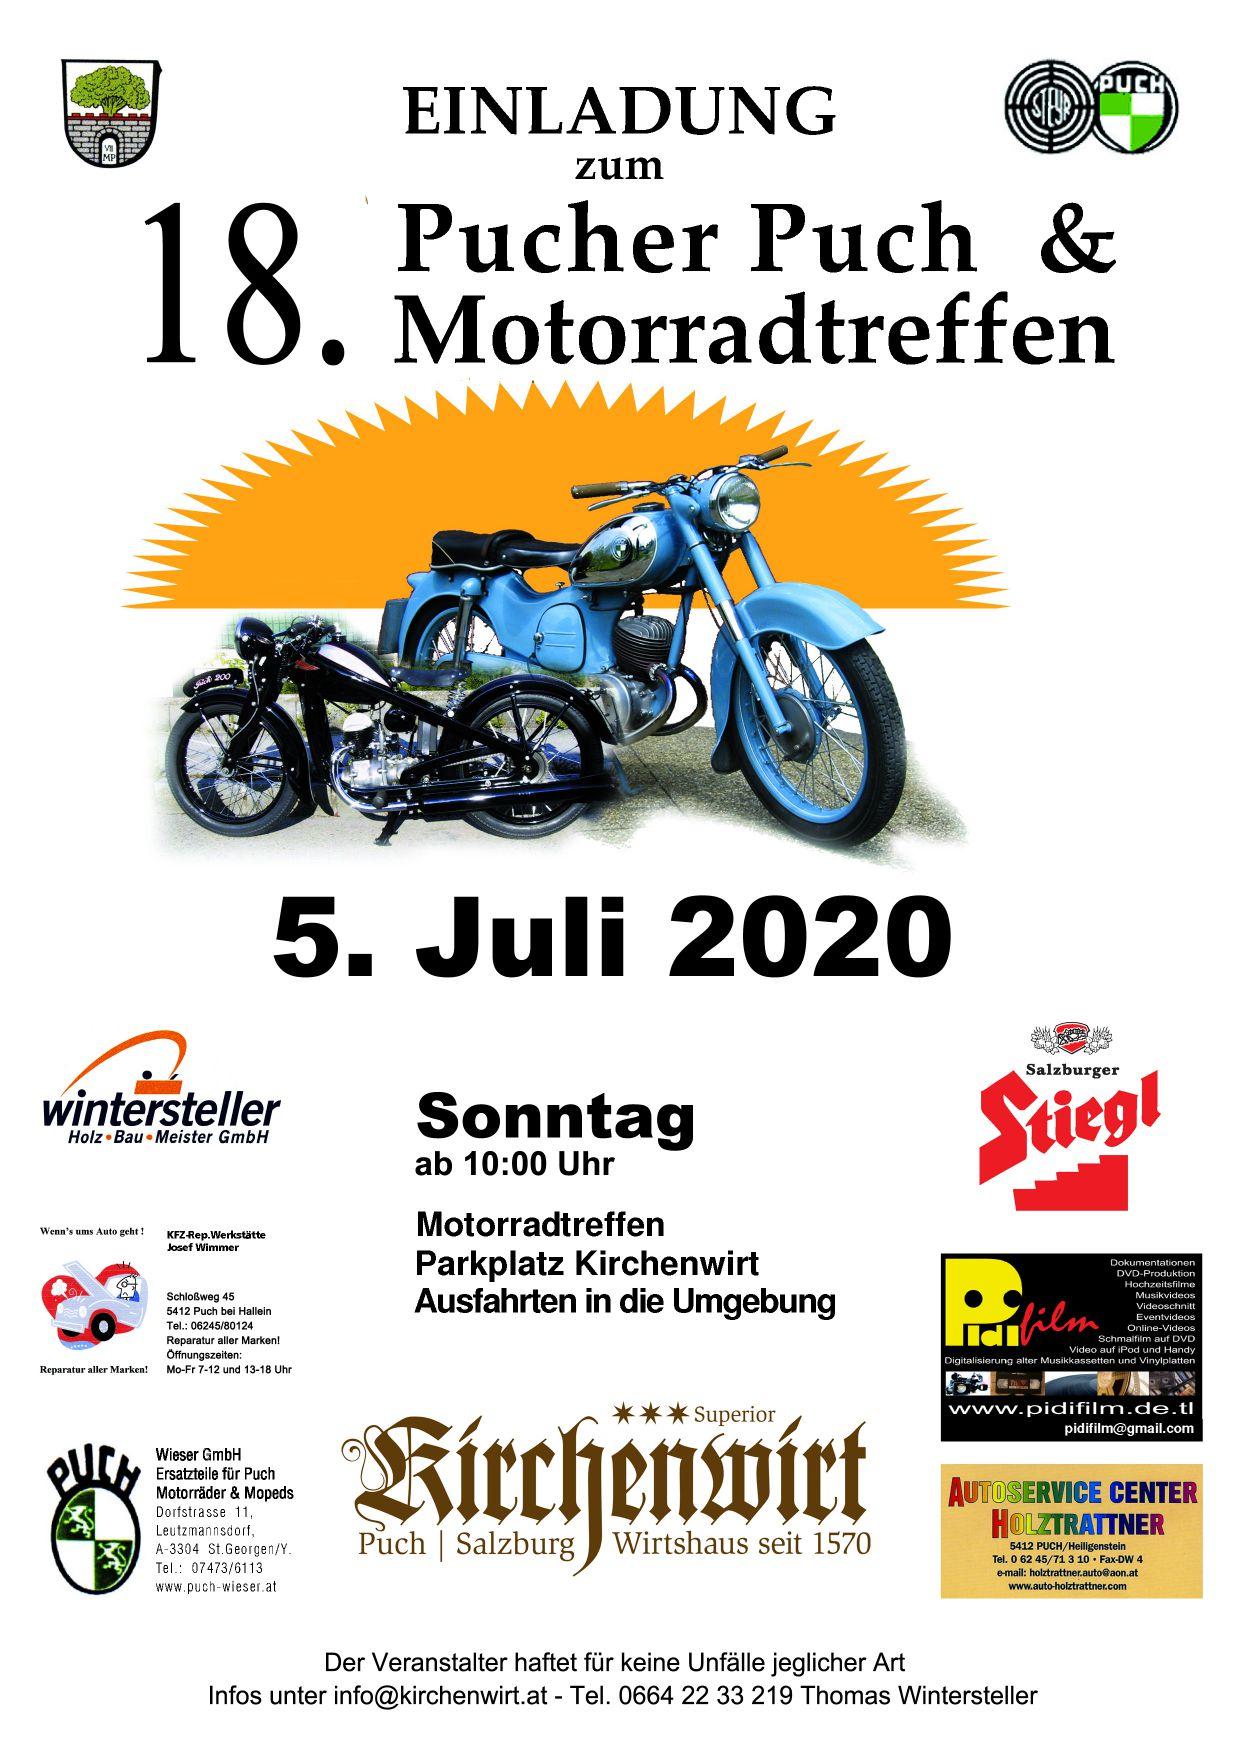 Pucher Puch & Motorradtreffen